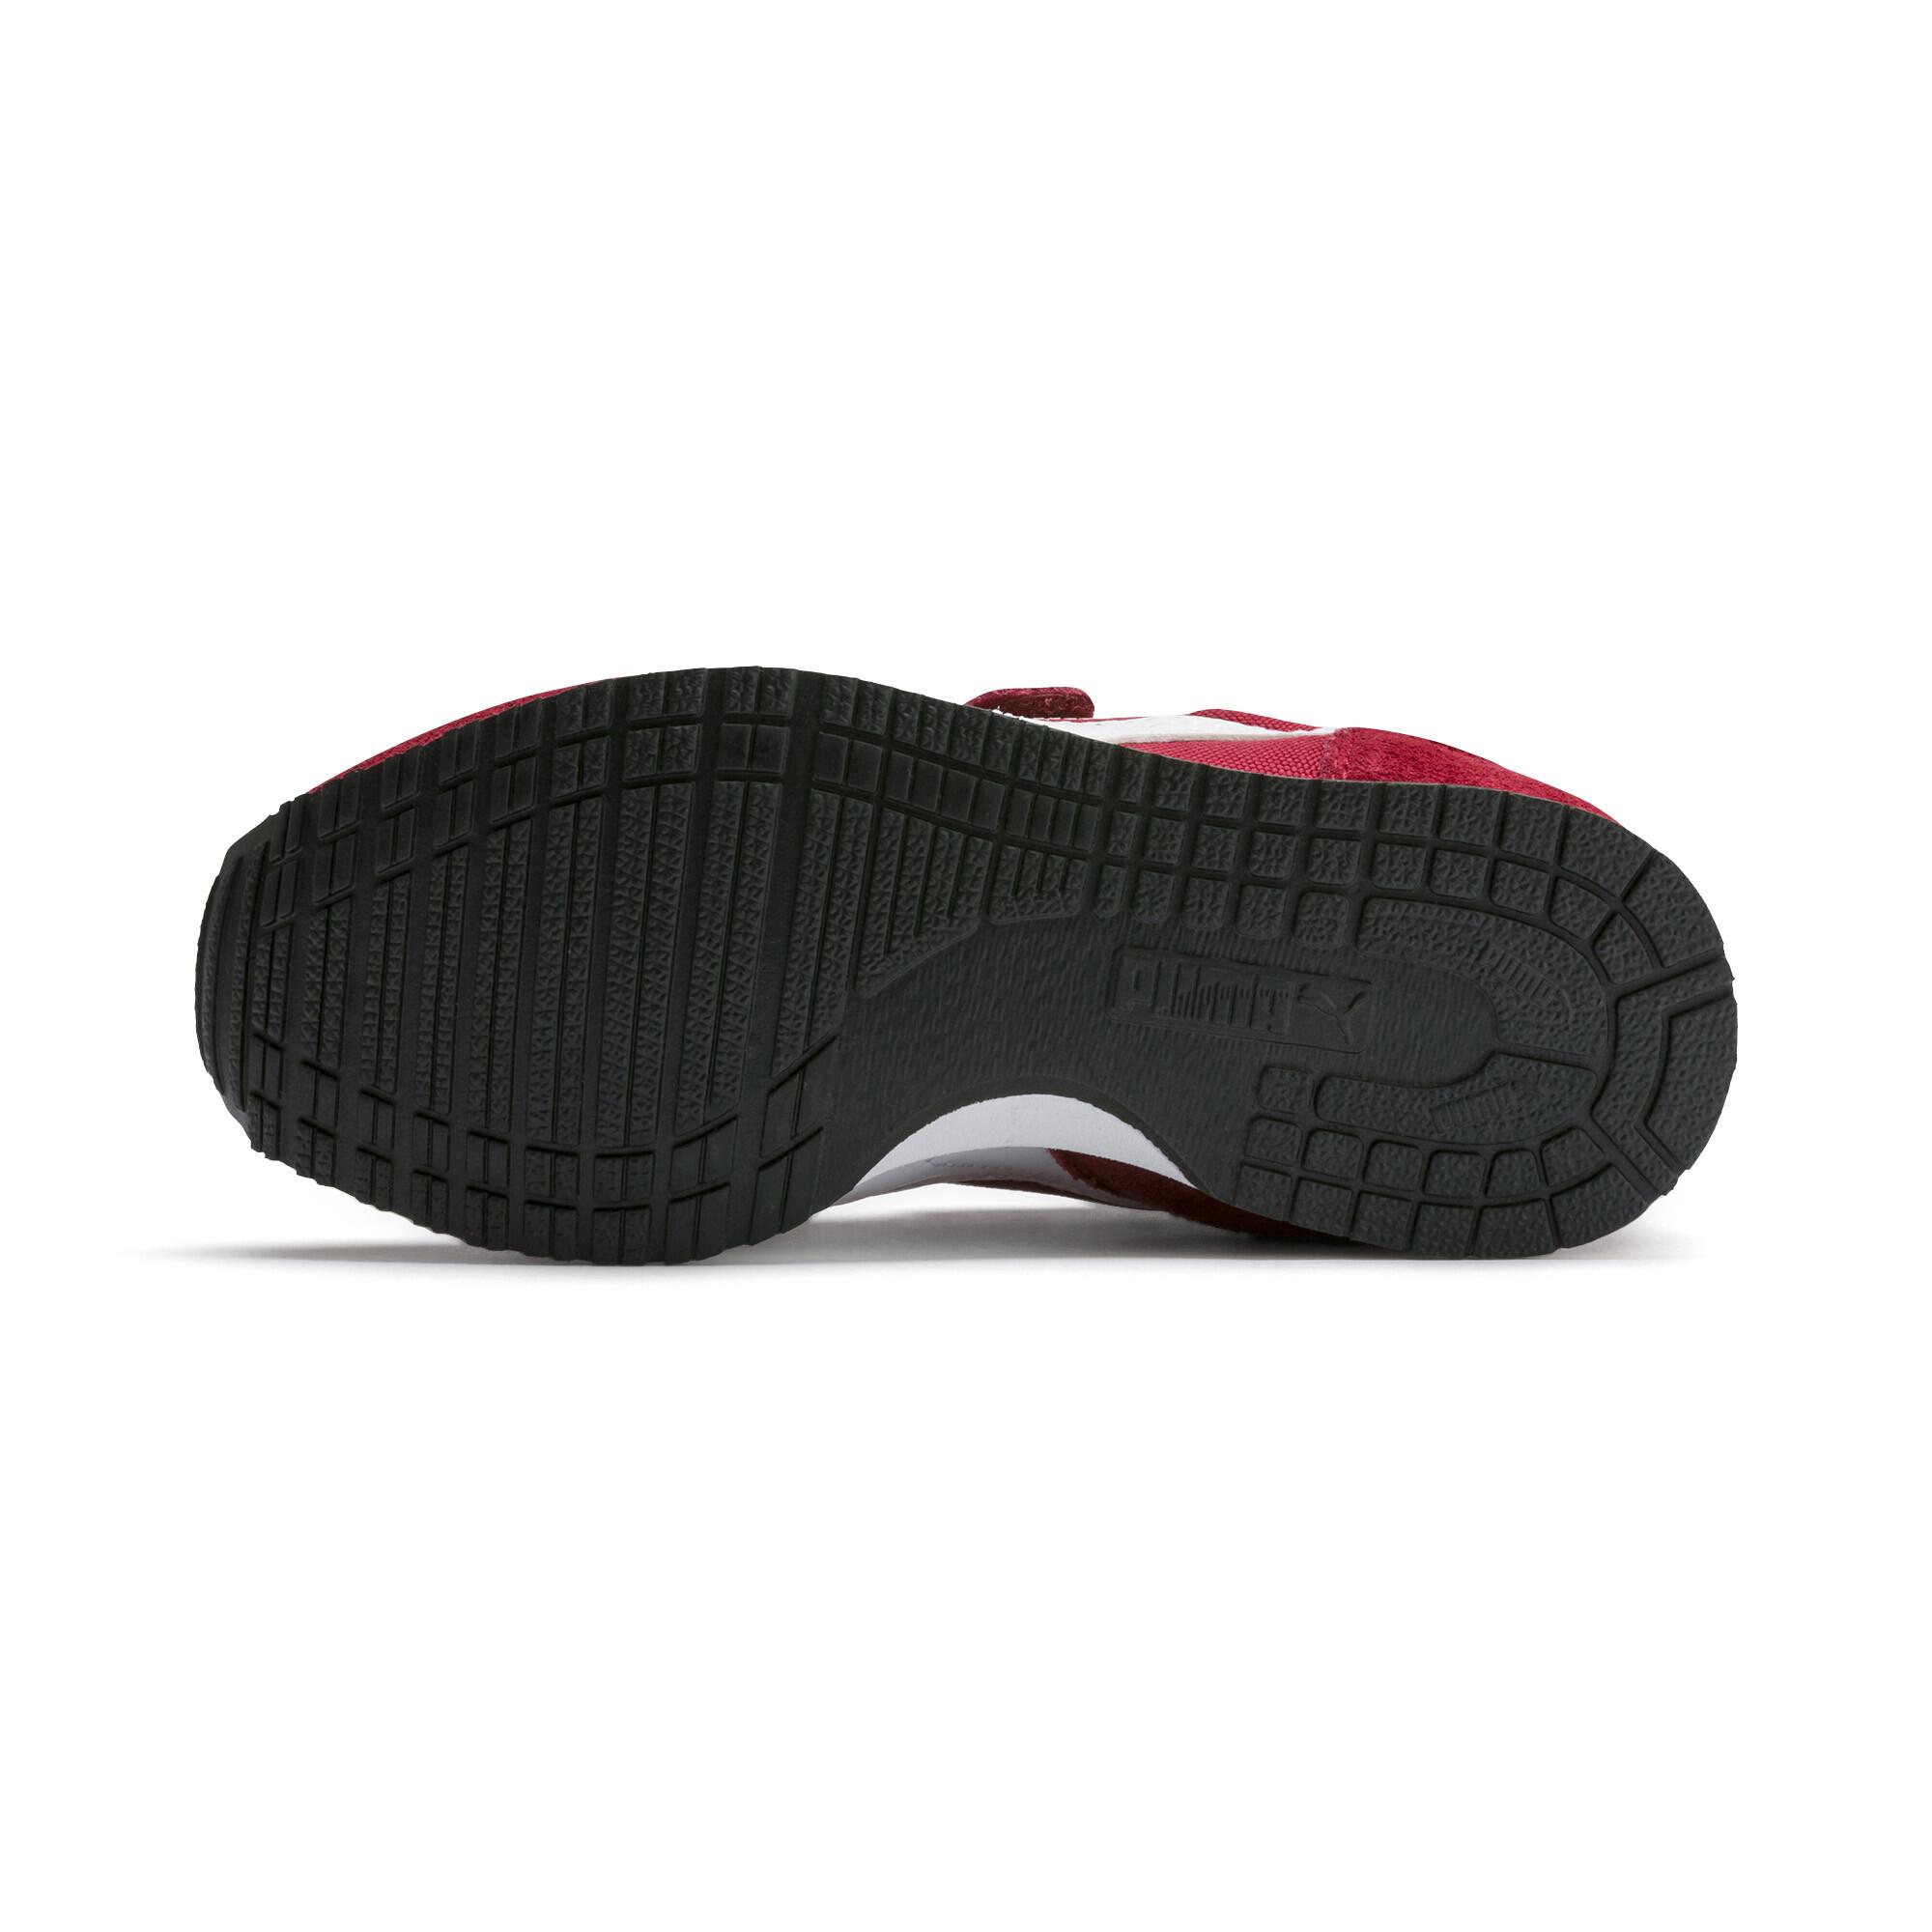 PUMA-Cabana-Racer-Little-Kids-039-Shoes-Kids-Shoe-Kids thumbnail 5